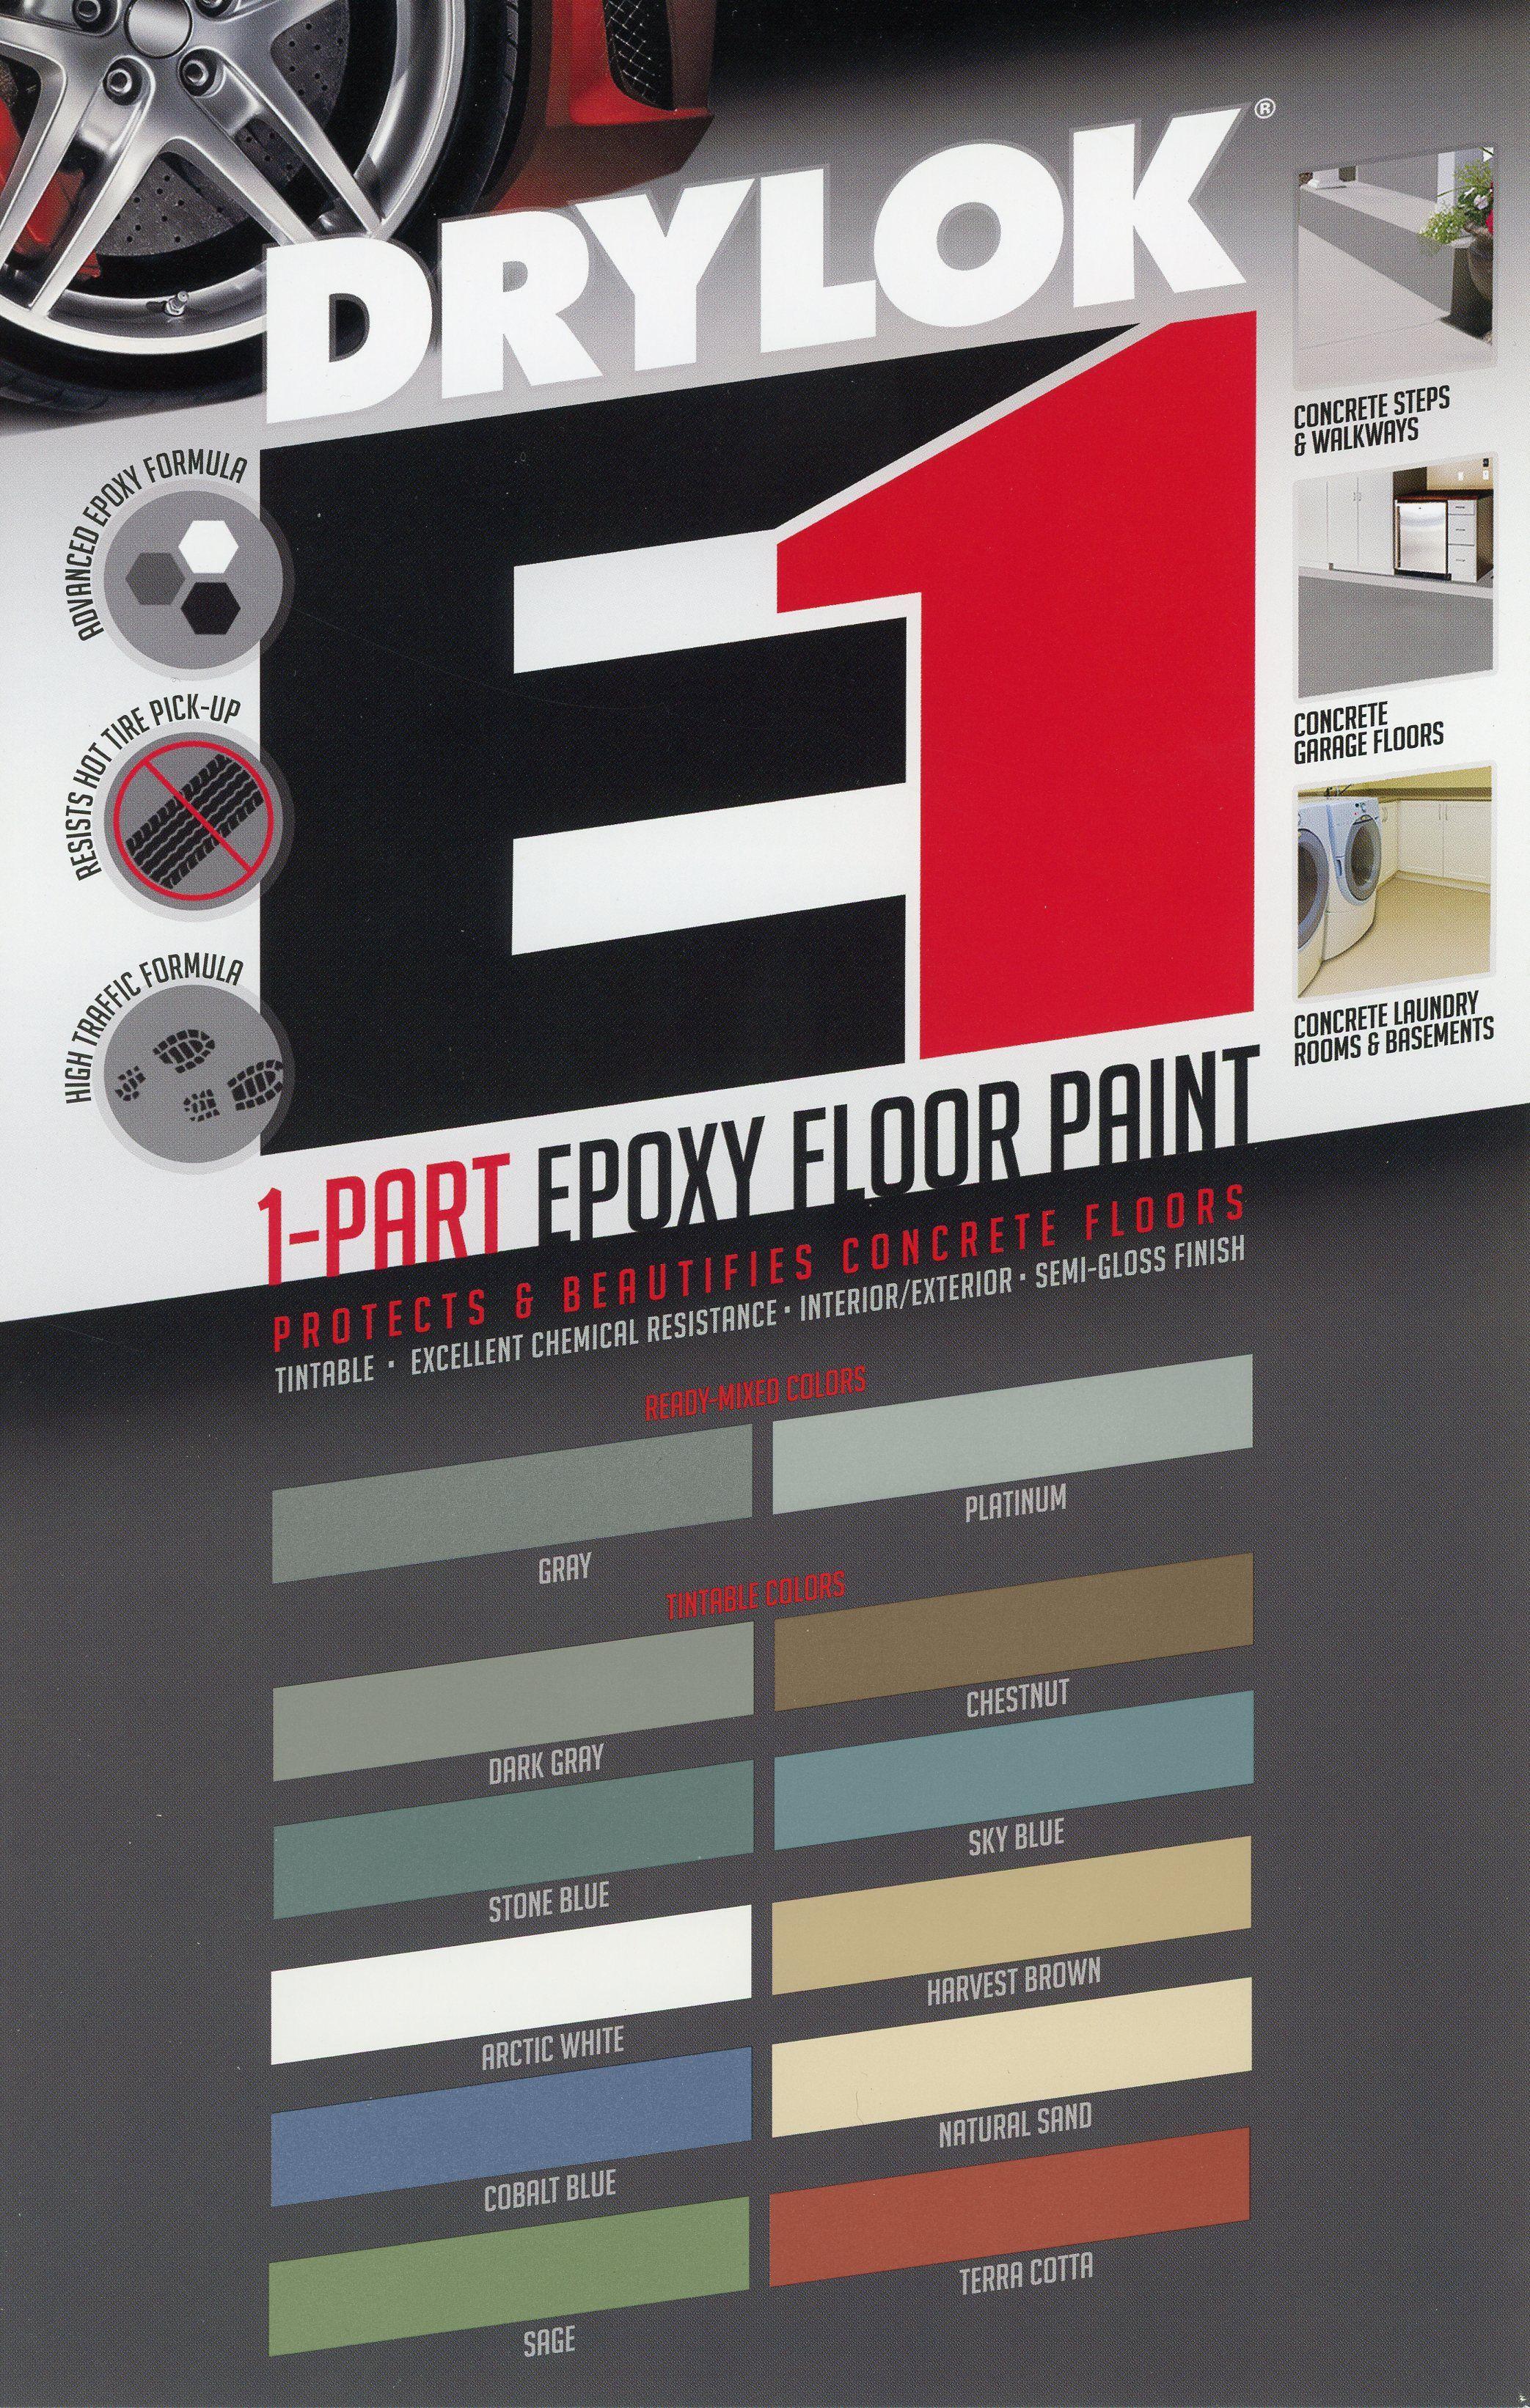 Drylok Garage Floor Paint Reviews Dandk Organizer